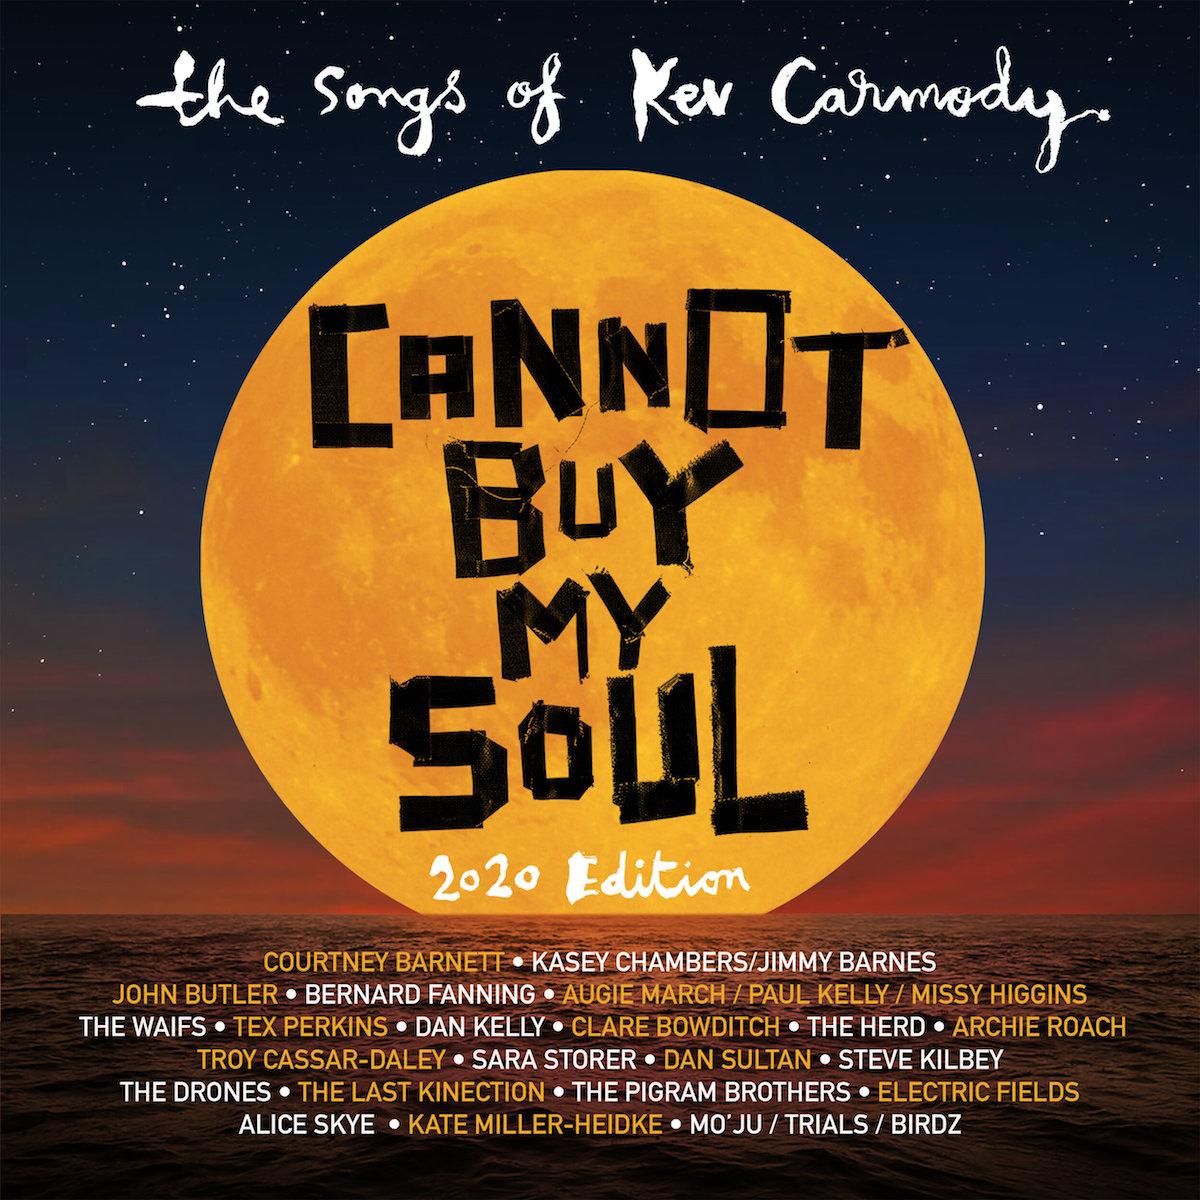 Courtney Barnett Covers Kev Carmodys Just For You: Stream